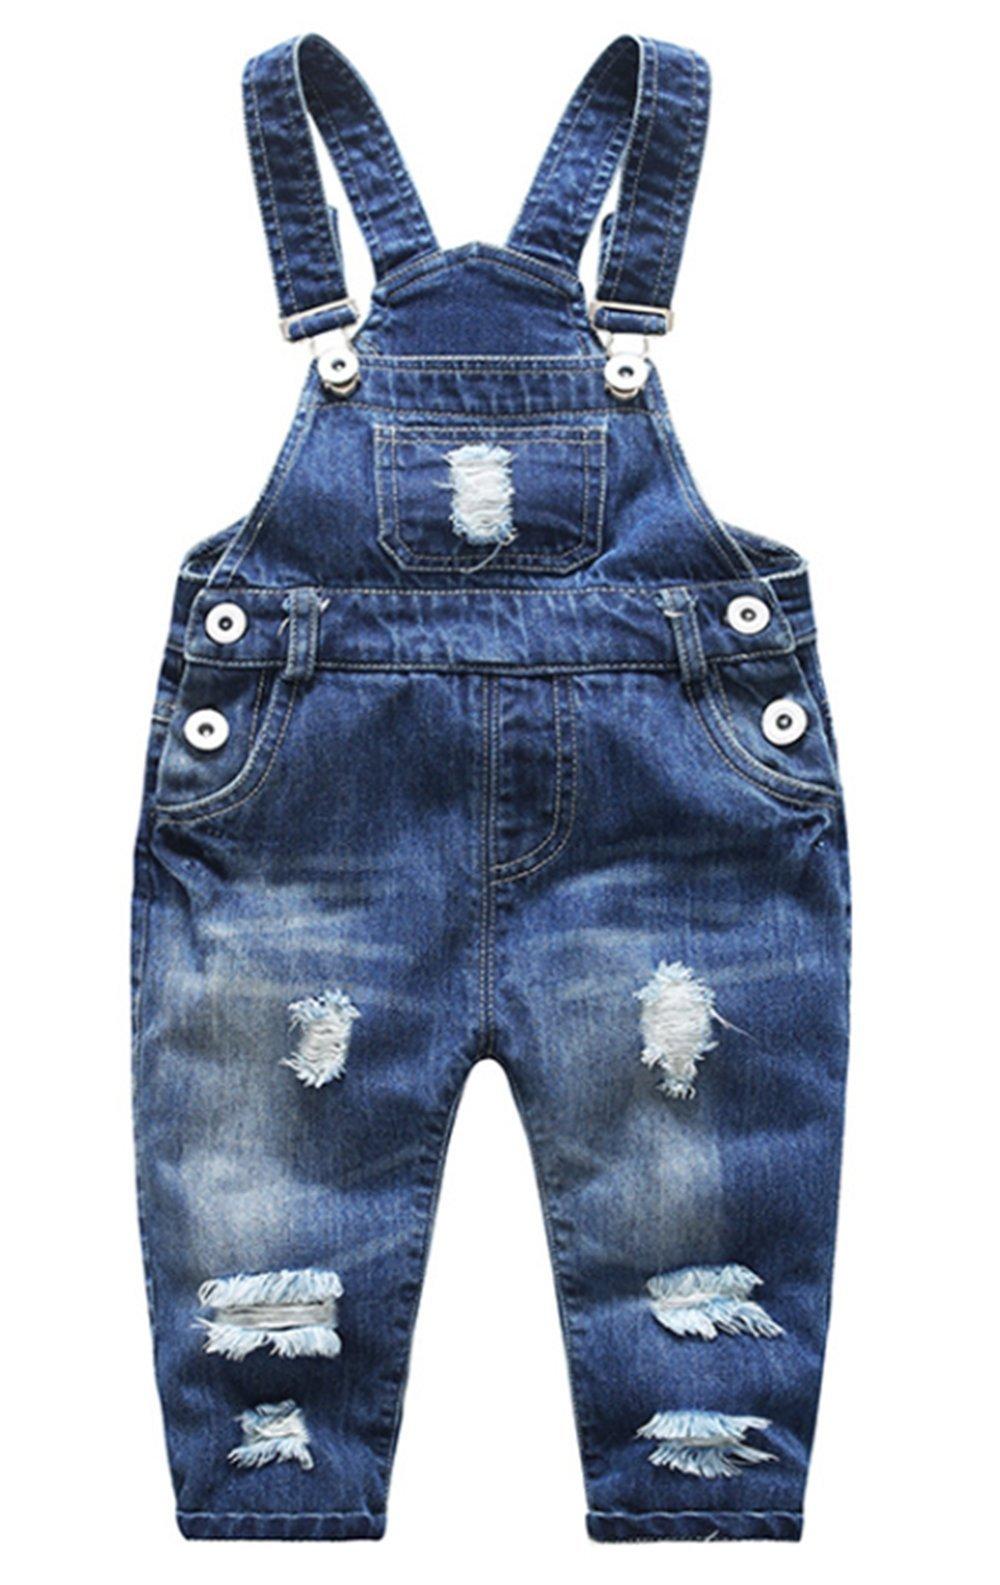 BANGELY Kids Boys Girls Casual Button Denim Overall Bib Jeans Pants (3-4Years, Dark Blue)